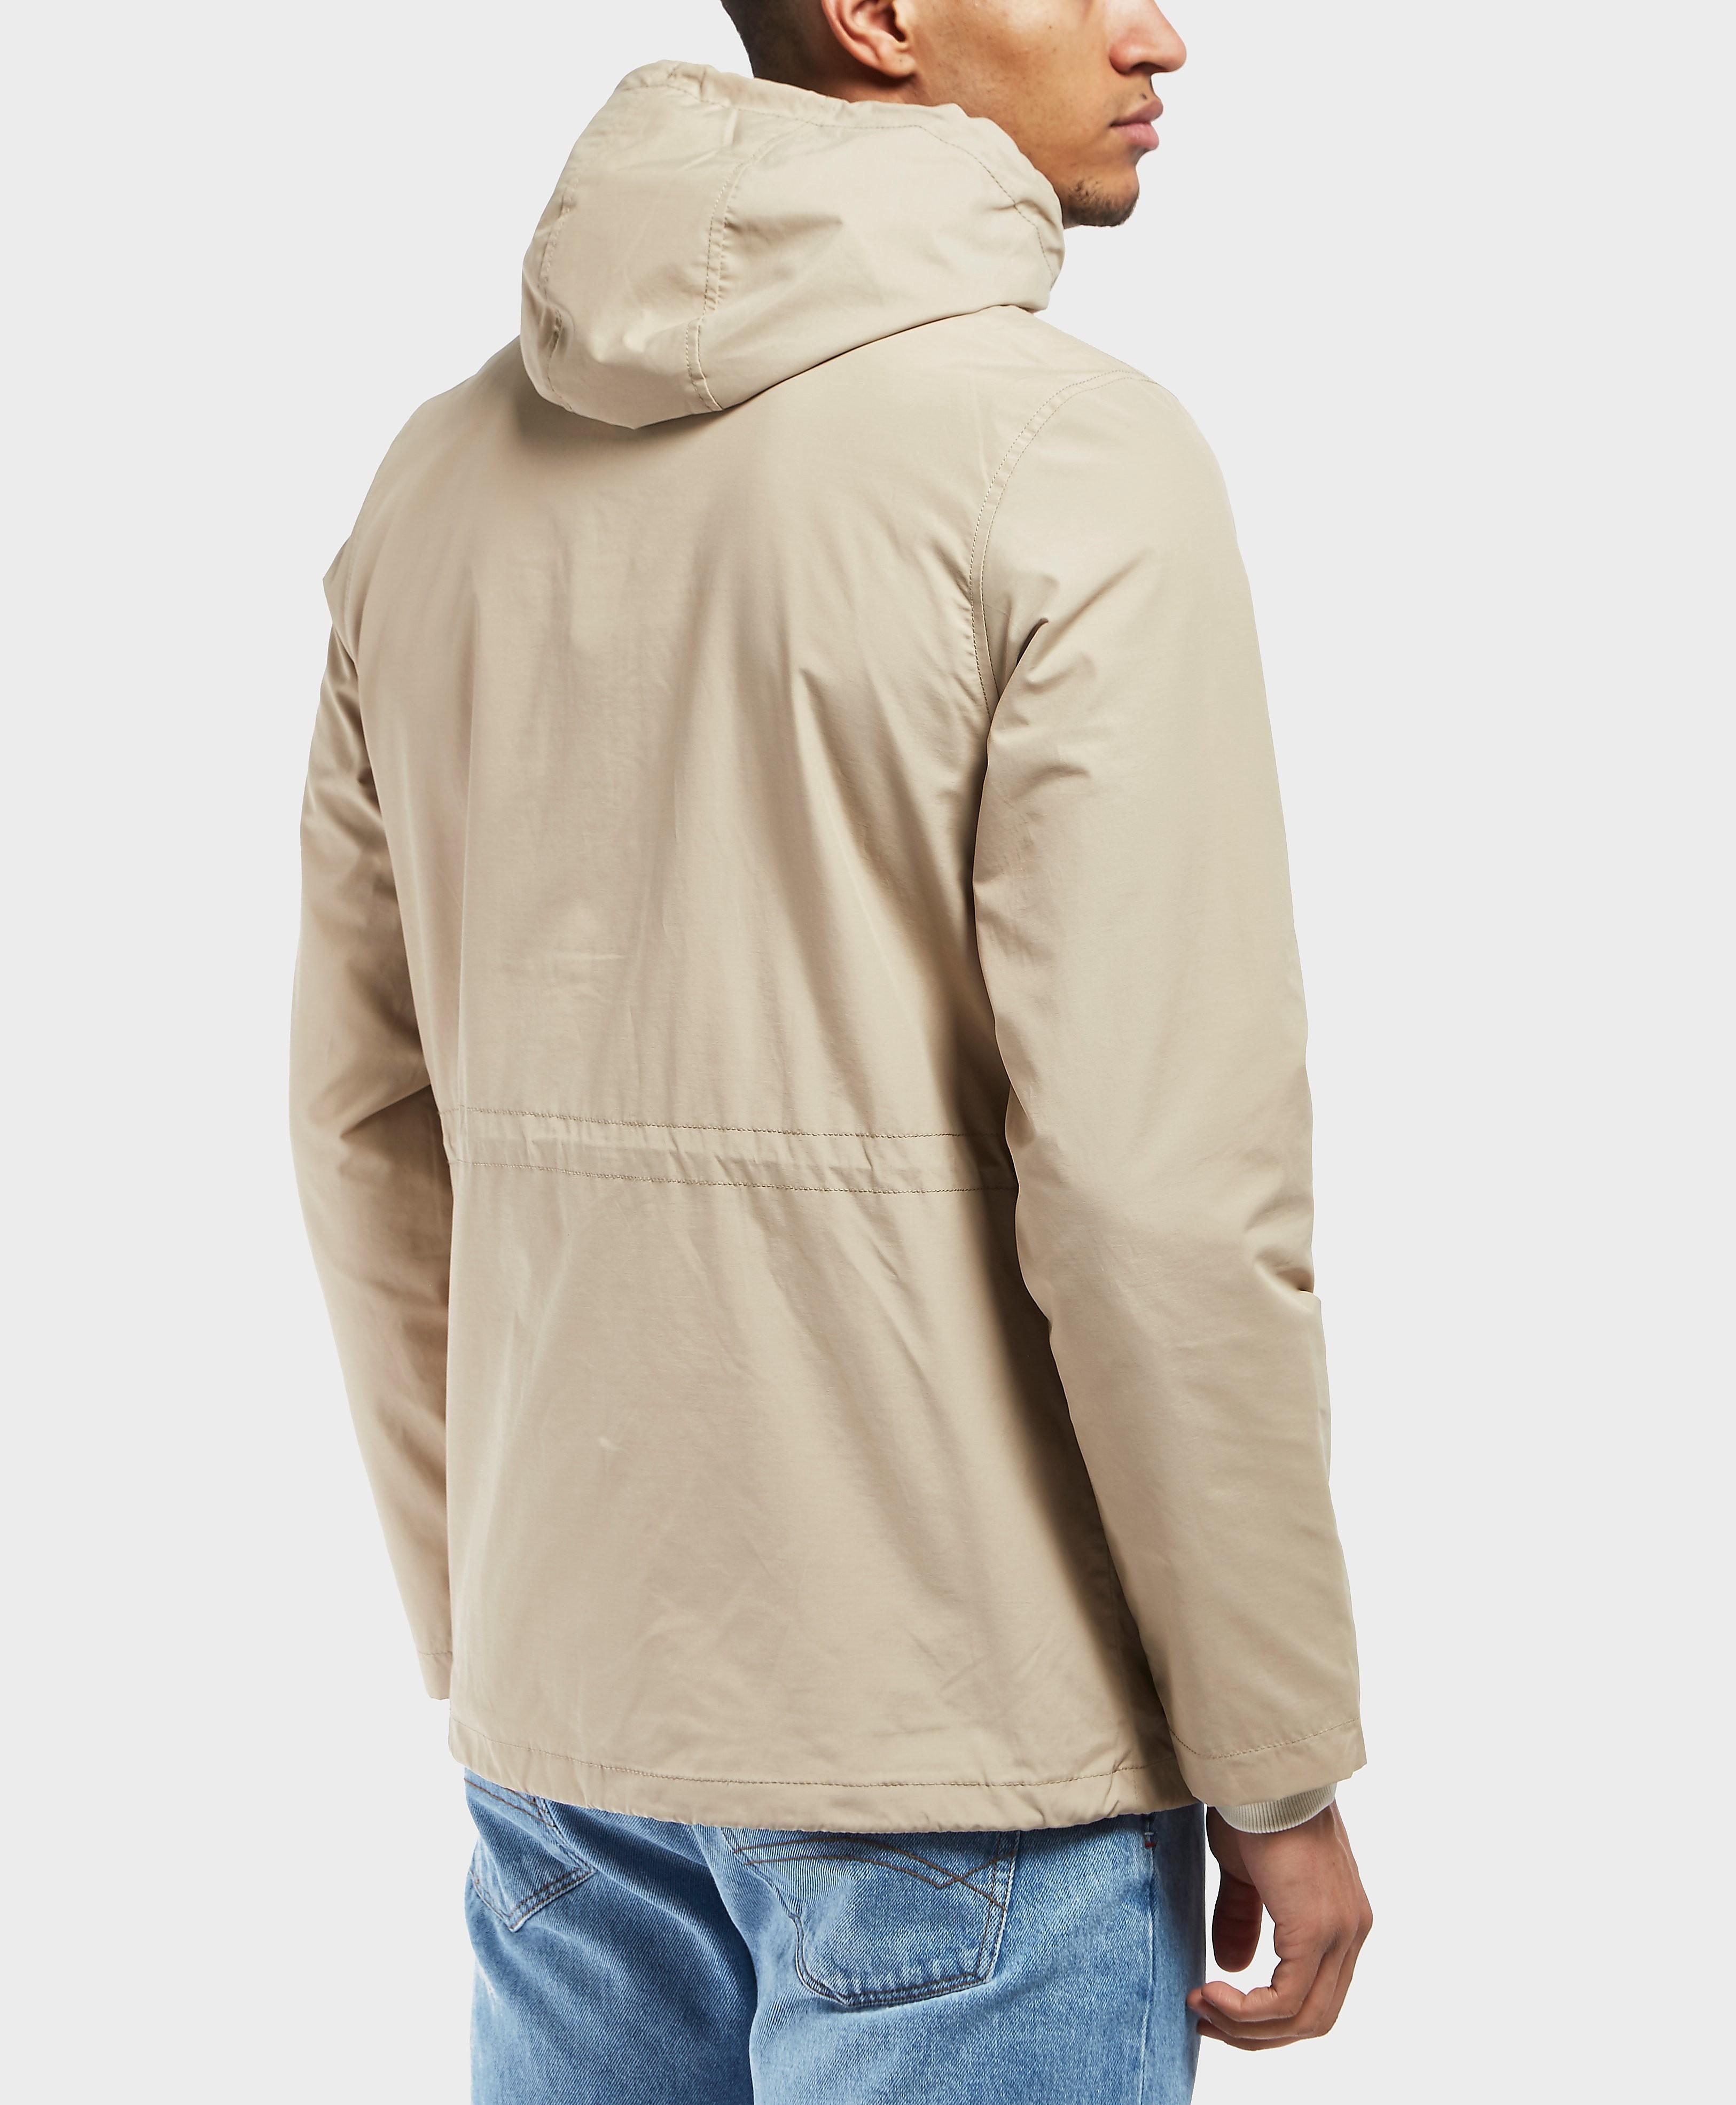 Lyle & Scott Full Zip Hooded Lightweight Jacket